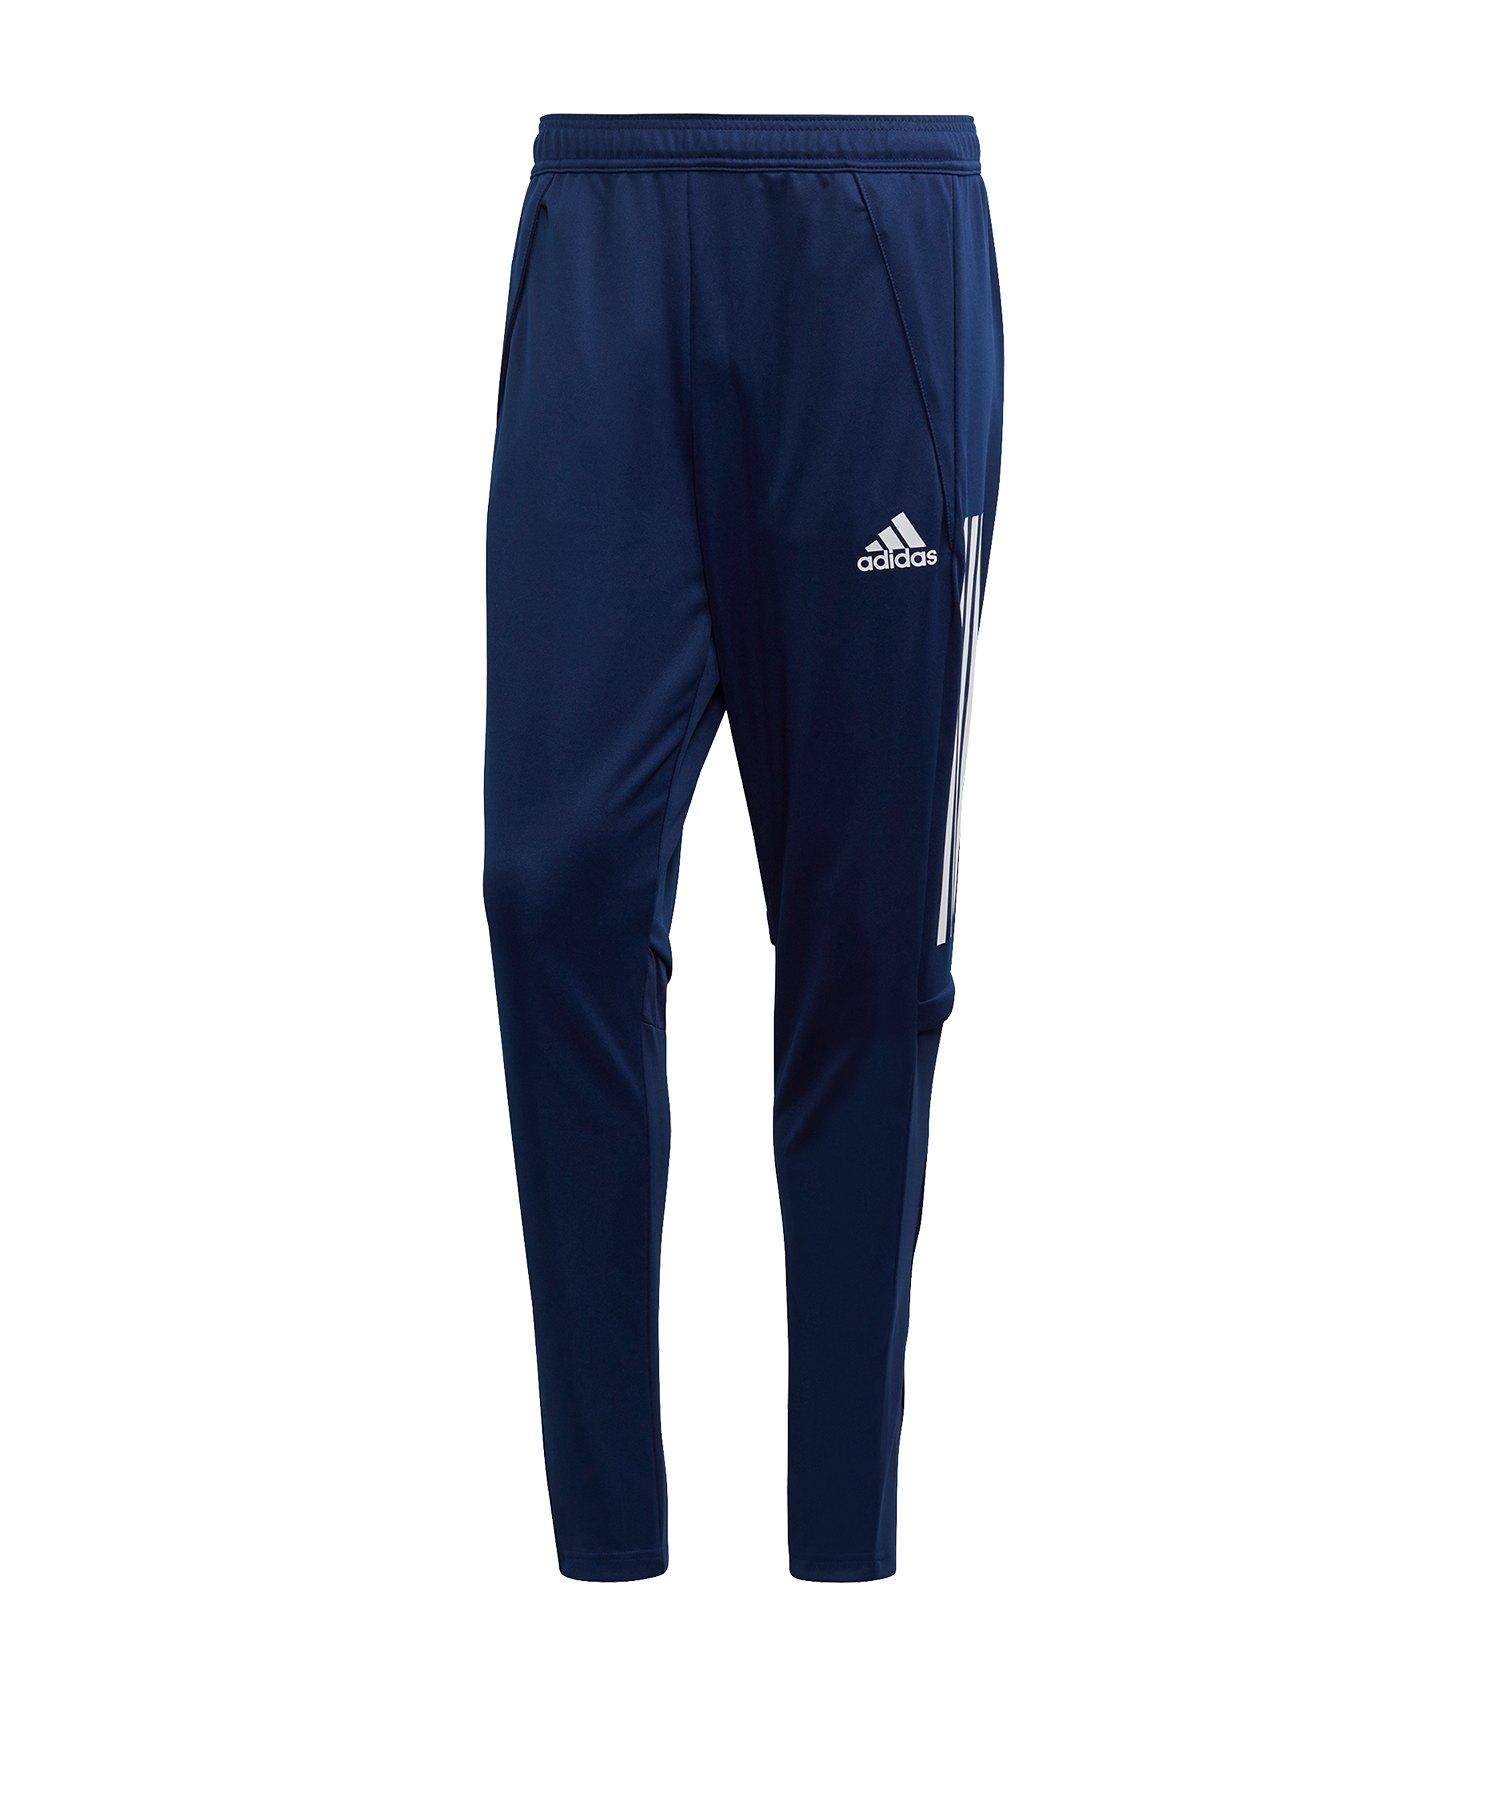 adidas Condivo 20 TrainingshoseDunkelblau - blau